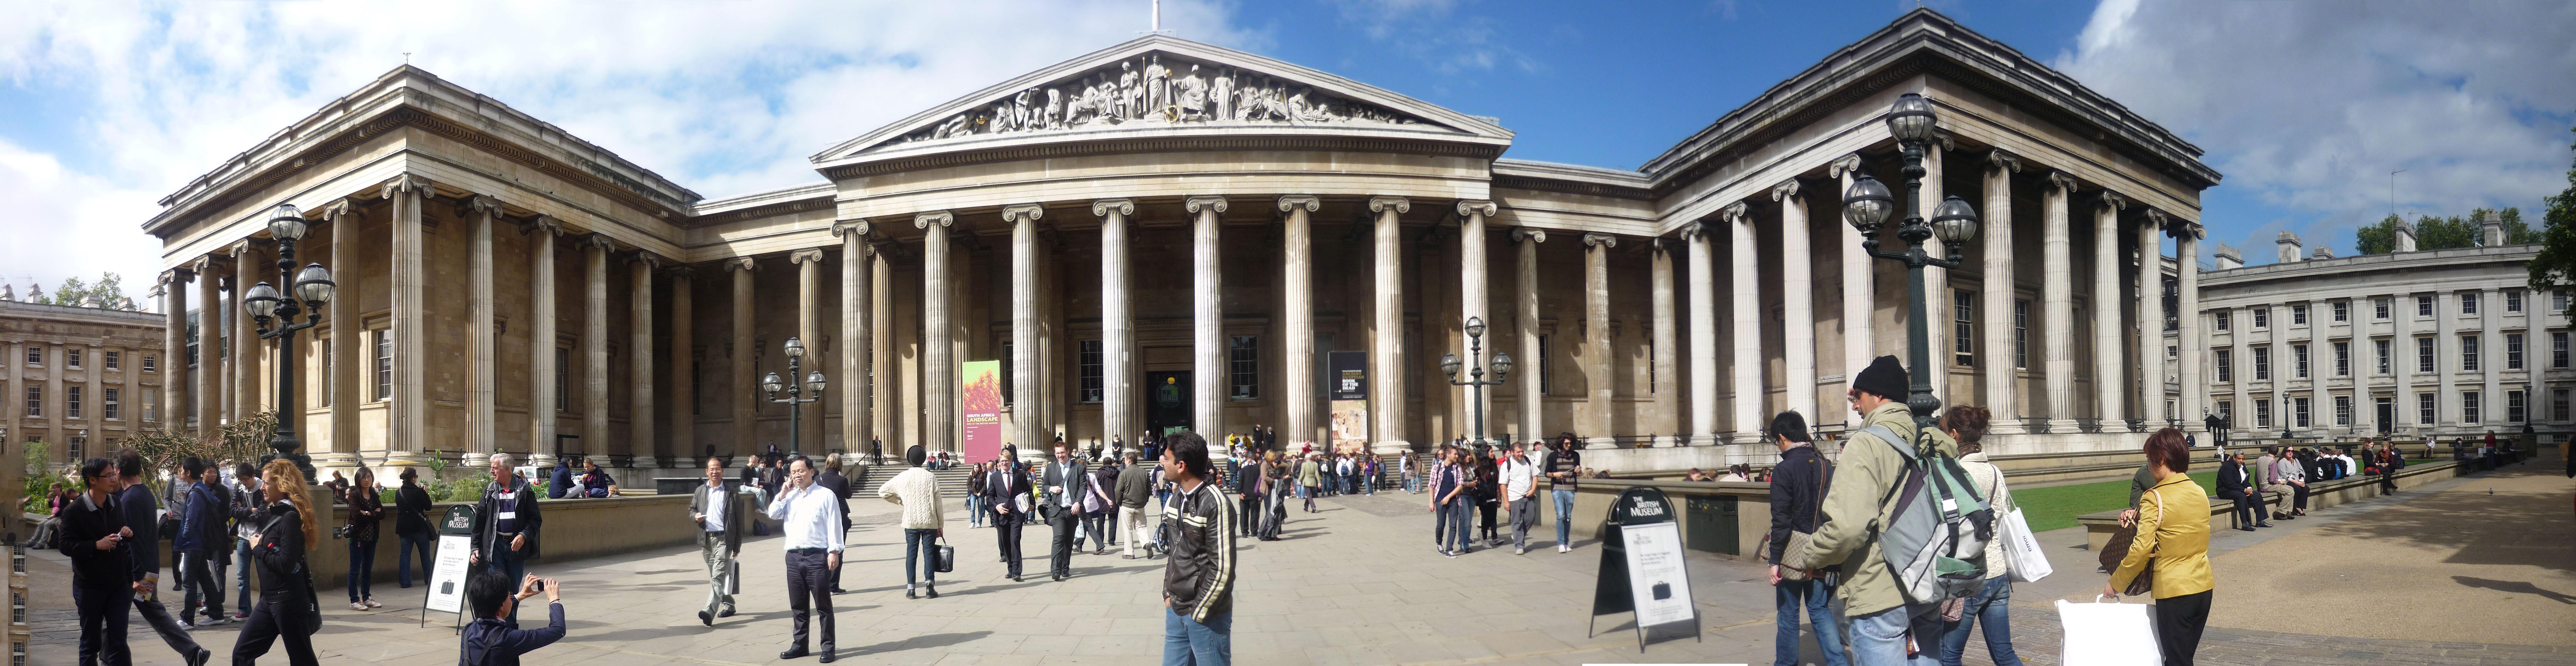 British Museum Of Natural History App